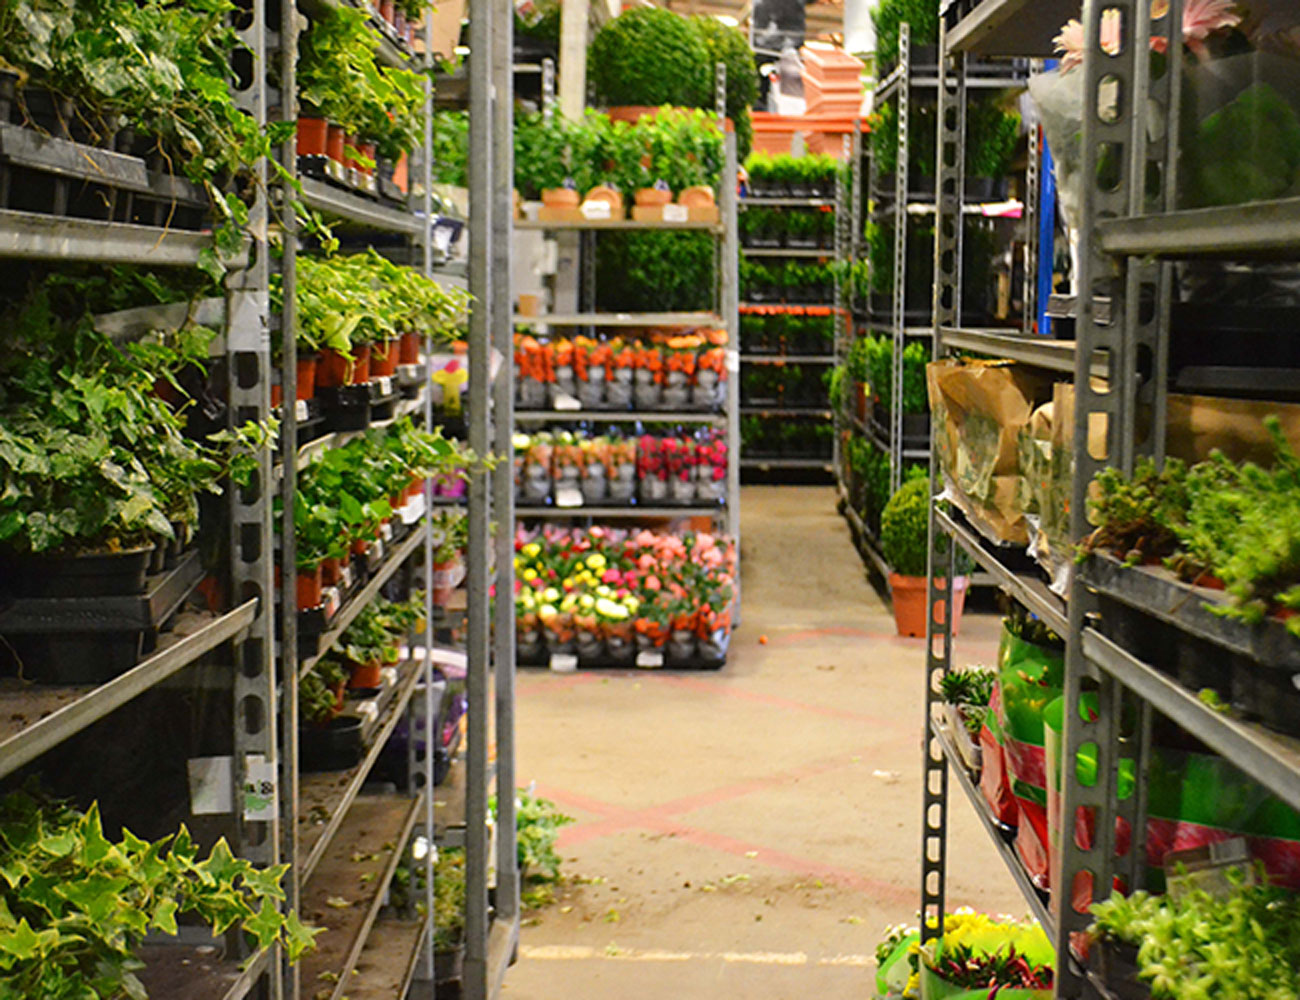 An Extraordinary Flower Market In The Heart Of Covent Garden